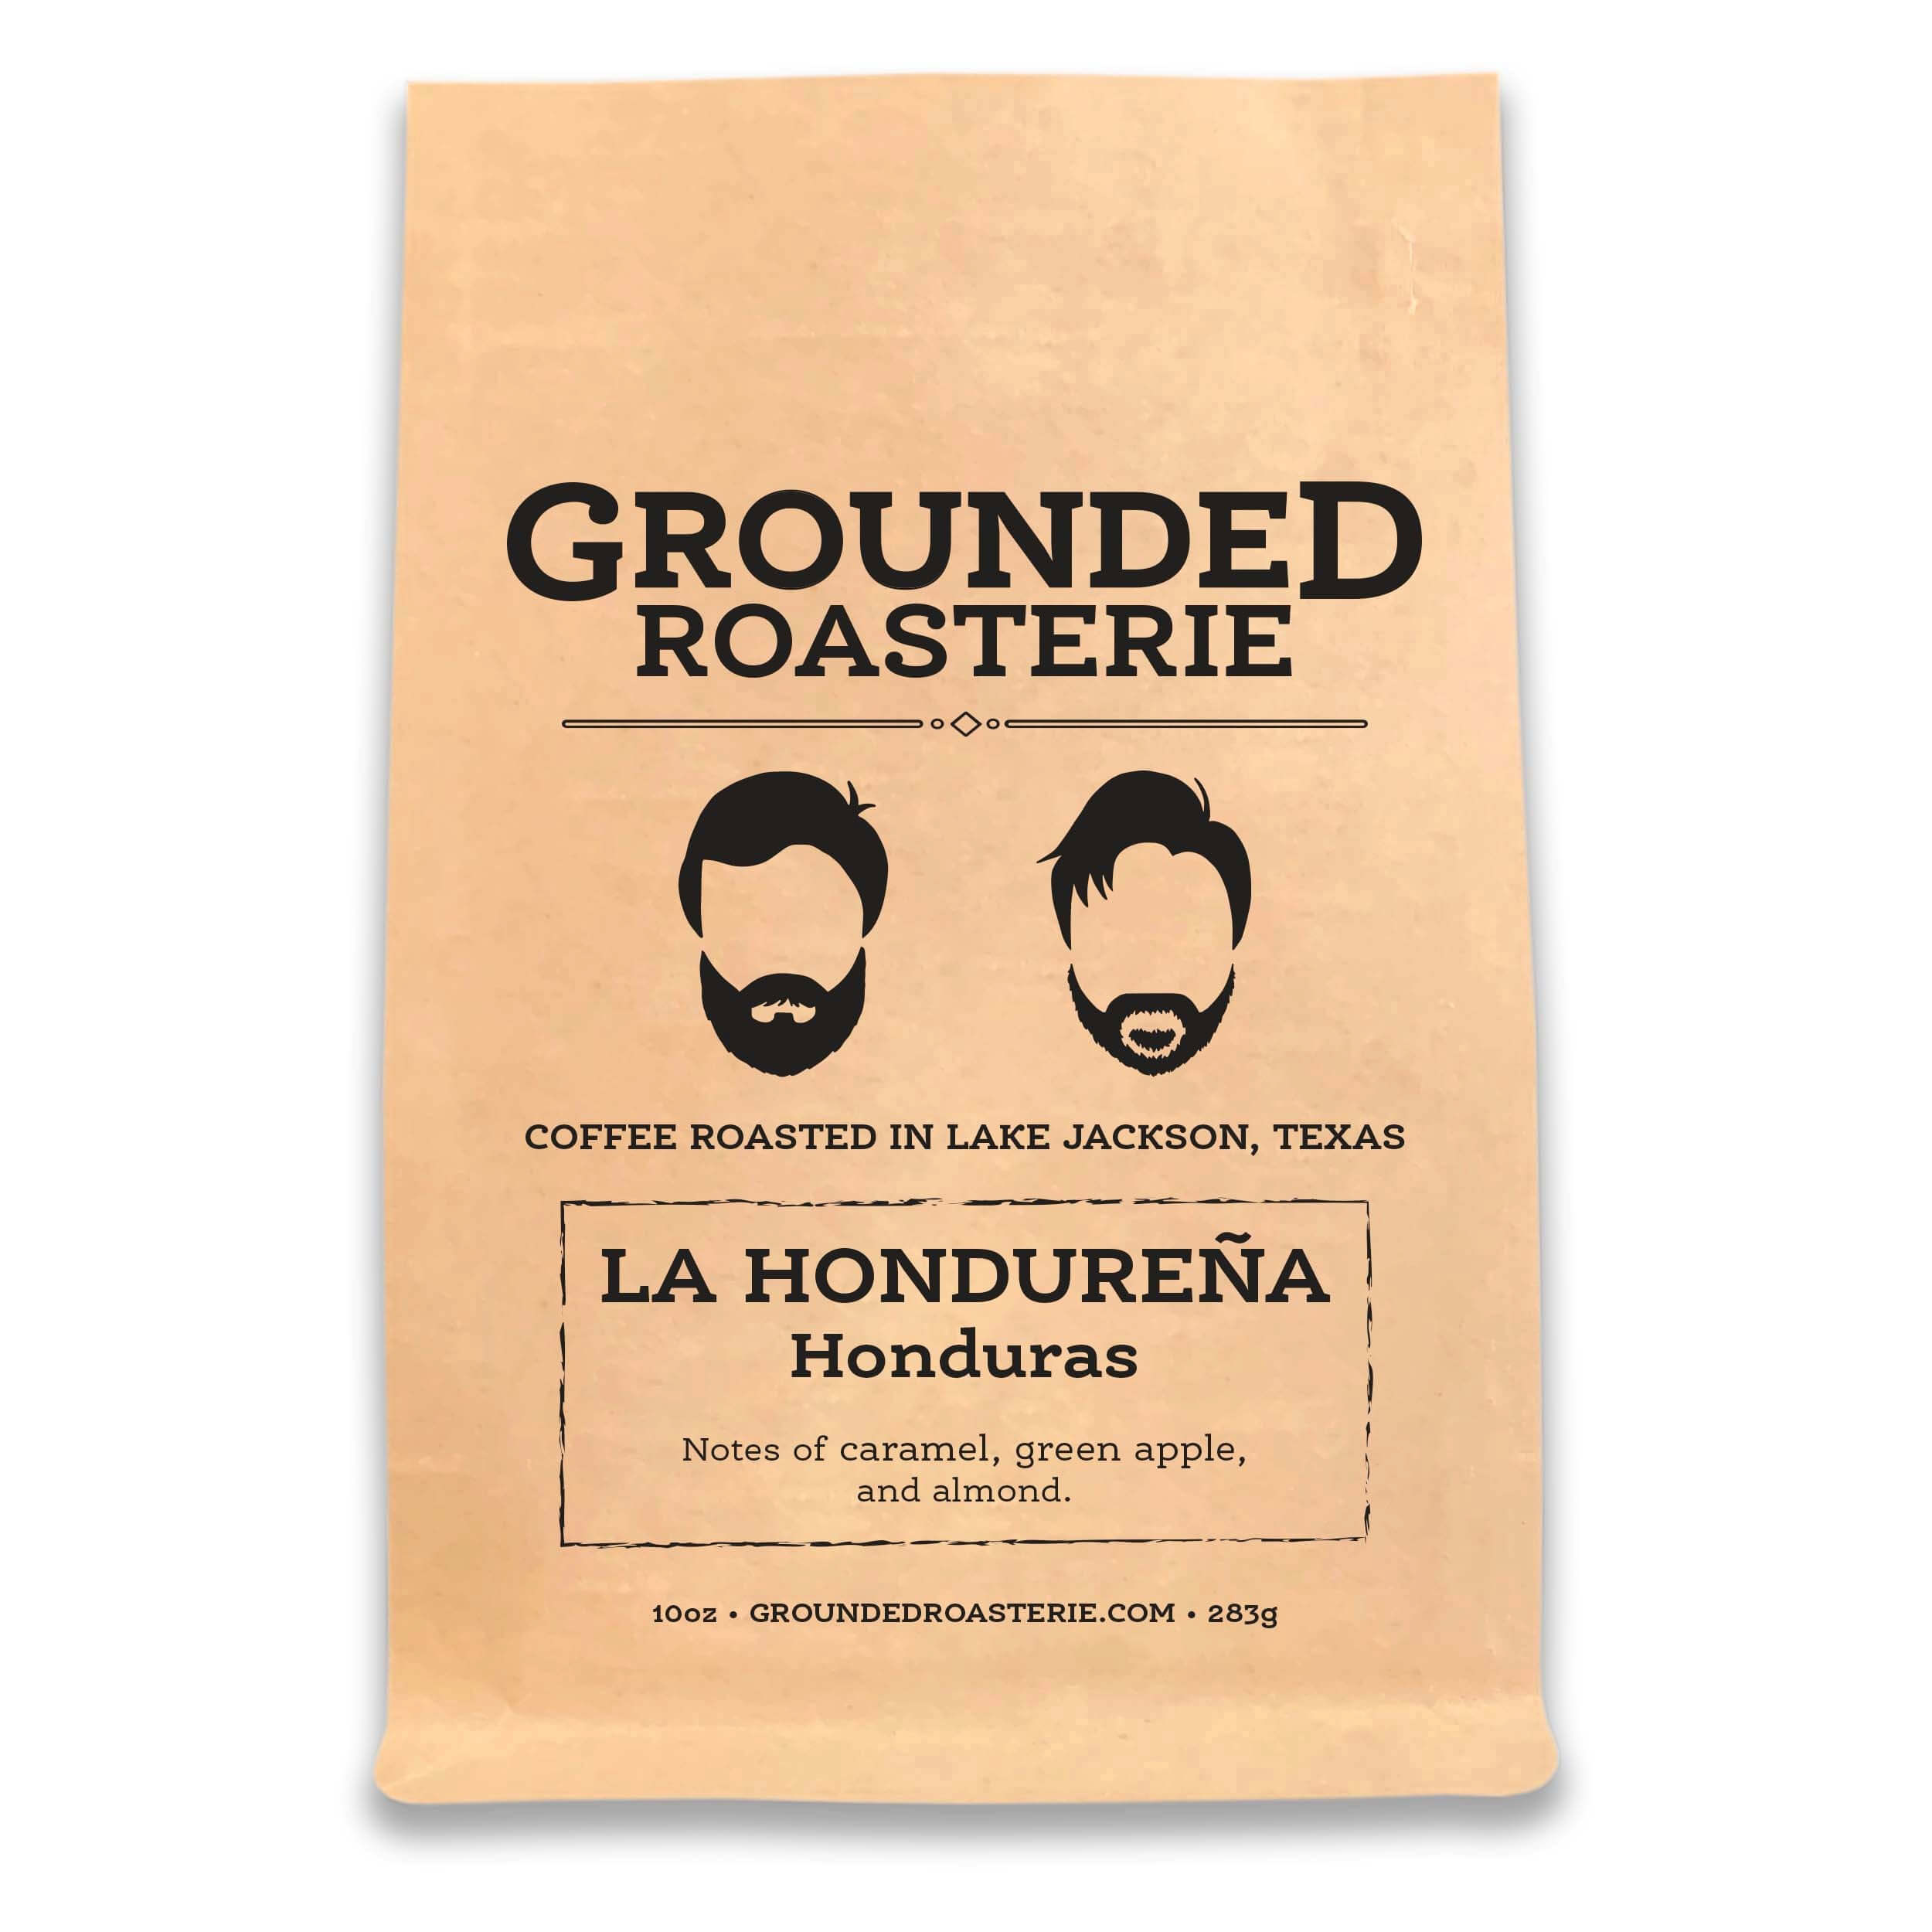 Honduras La Hondureña from Grounded Roasterie